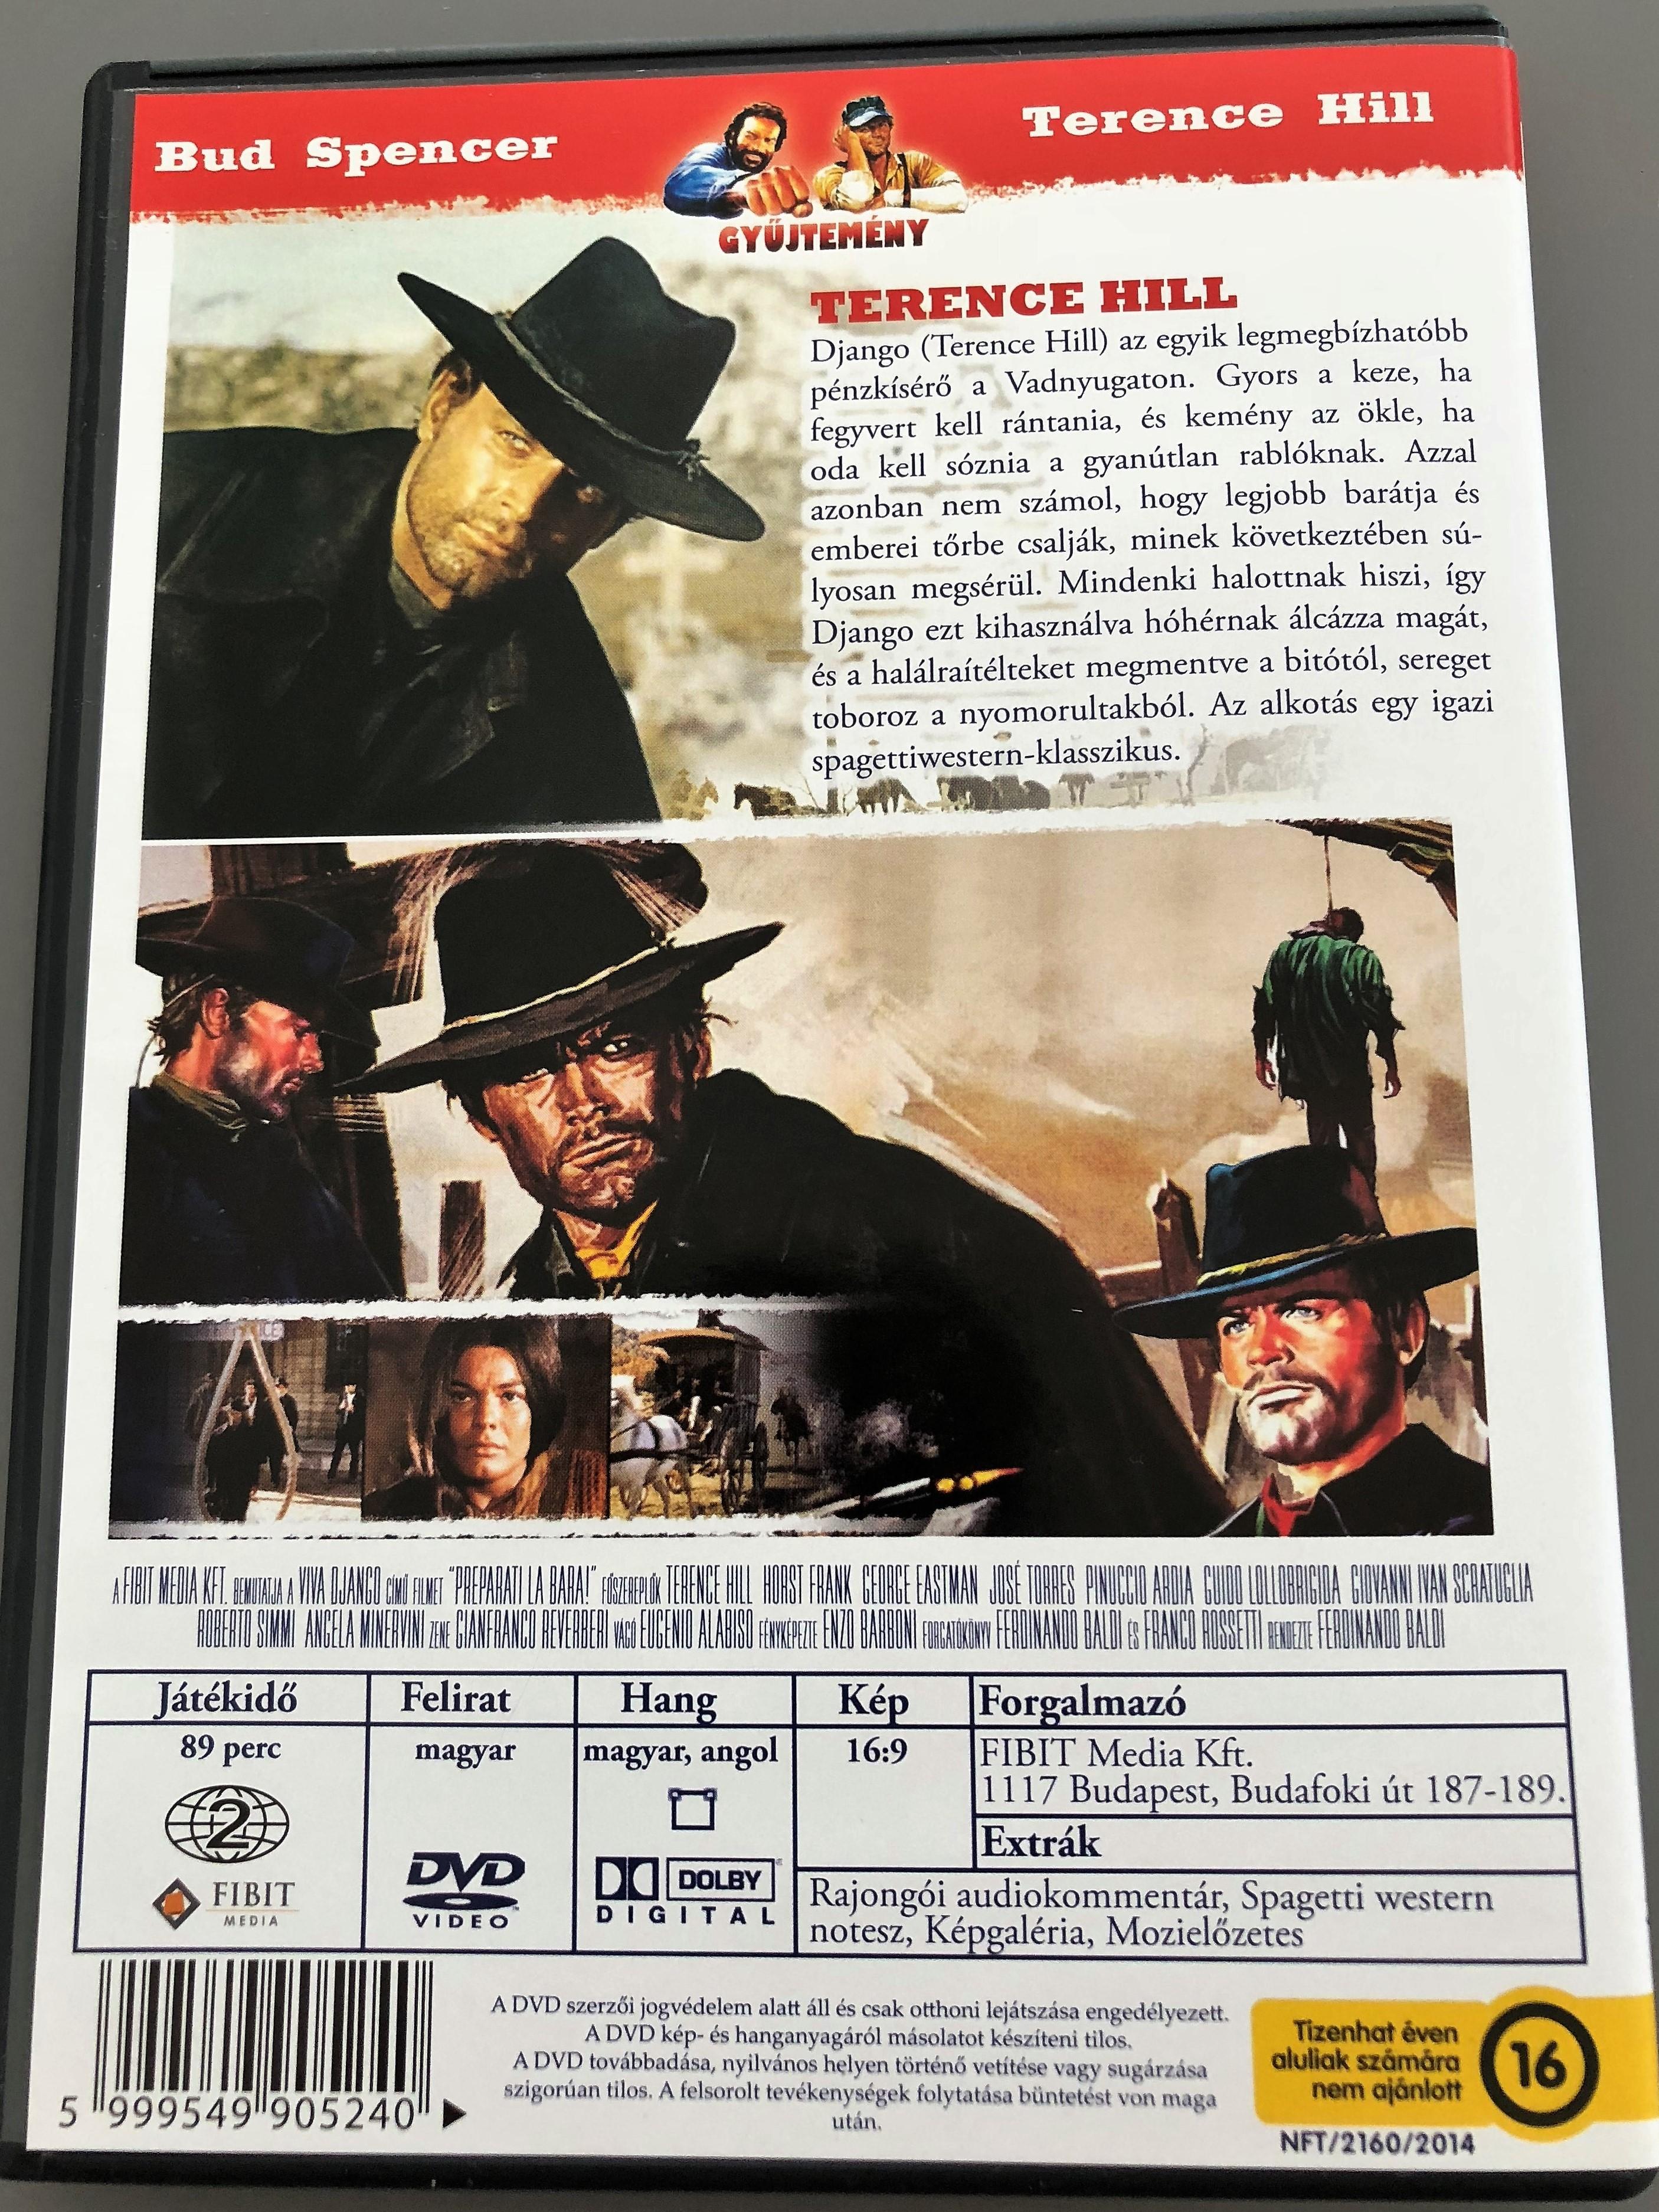 preparati-la-bara-dvd-1968-viva-django-django-prepare-a-coffin-directed-by-ferninando-baldi-starring-terence-hill-horst-frank-george-eastman-jos-torres-az-eredeti-jr-ti-l-szl-szinkronnal-bud-spencer-terenc.jpg